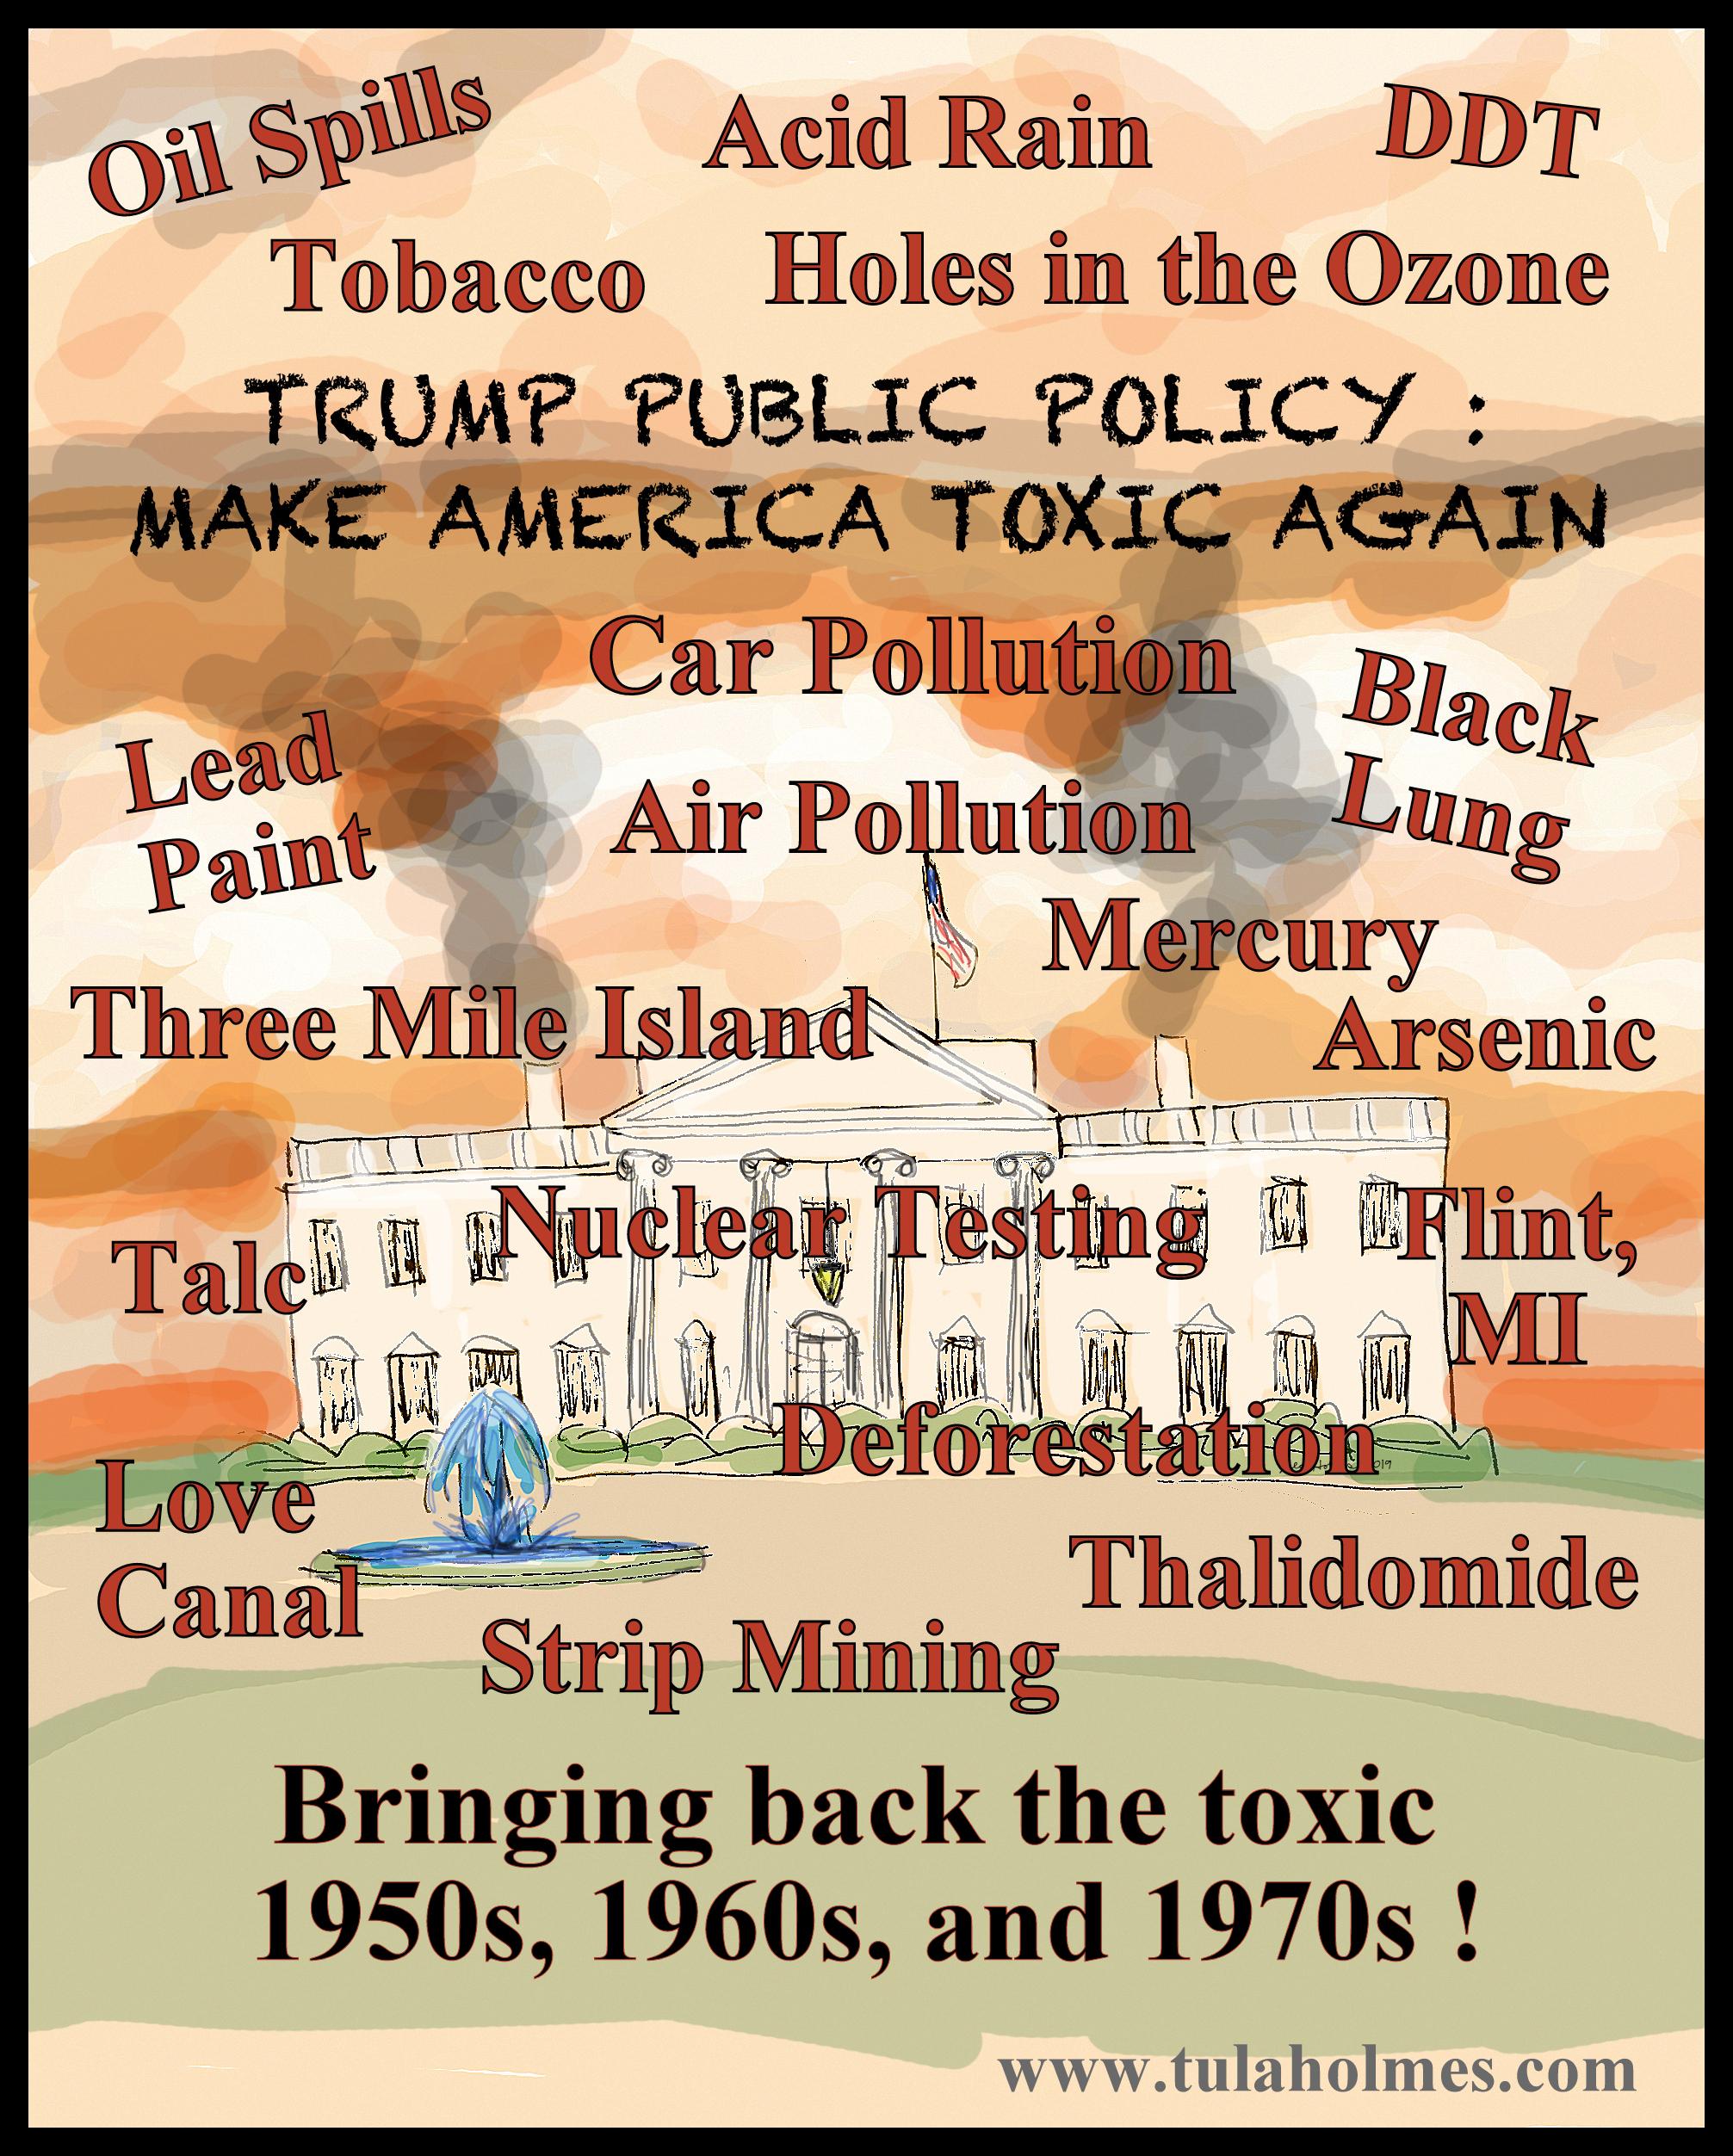 Make America Toxic Again- Copyright 2019